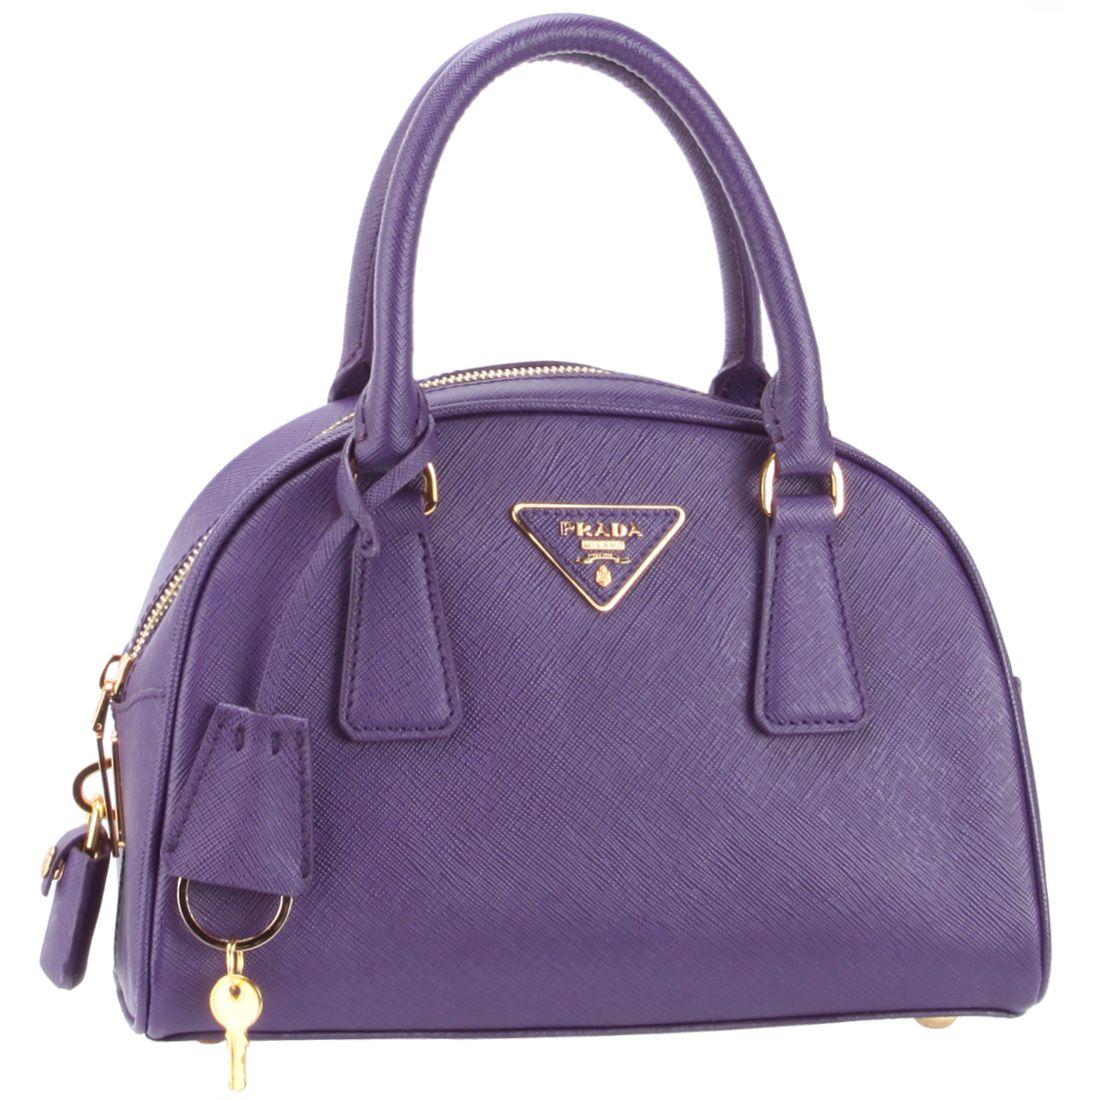 www.cheapdesignerhub com  2013 latest LV handbags online outlet, cheap designer handbags online outlet, free shipping cheap LOUIS VUITTON handbags